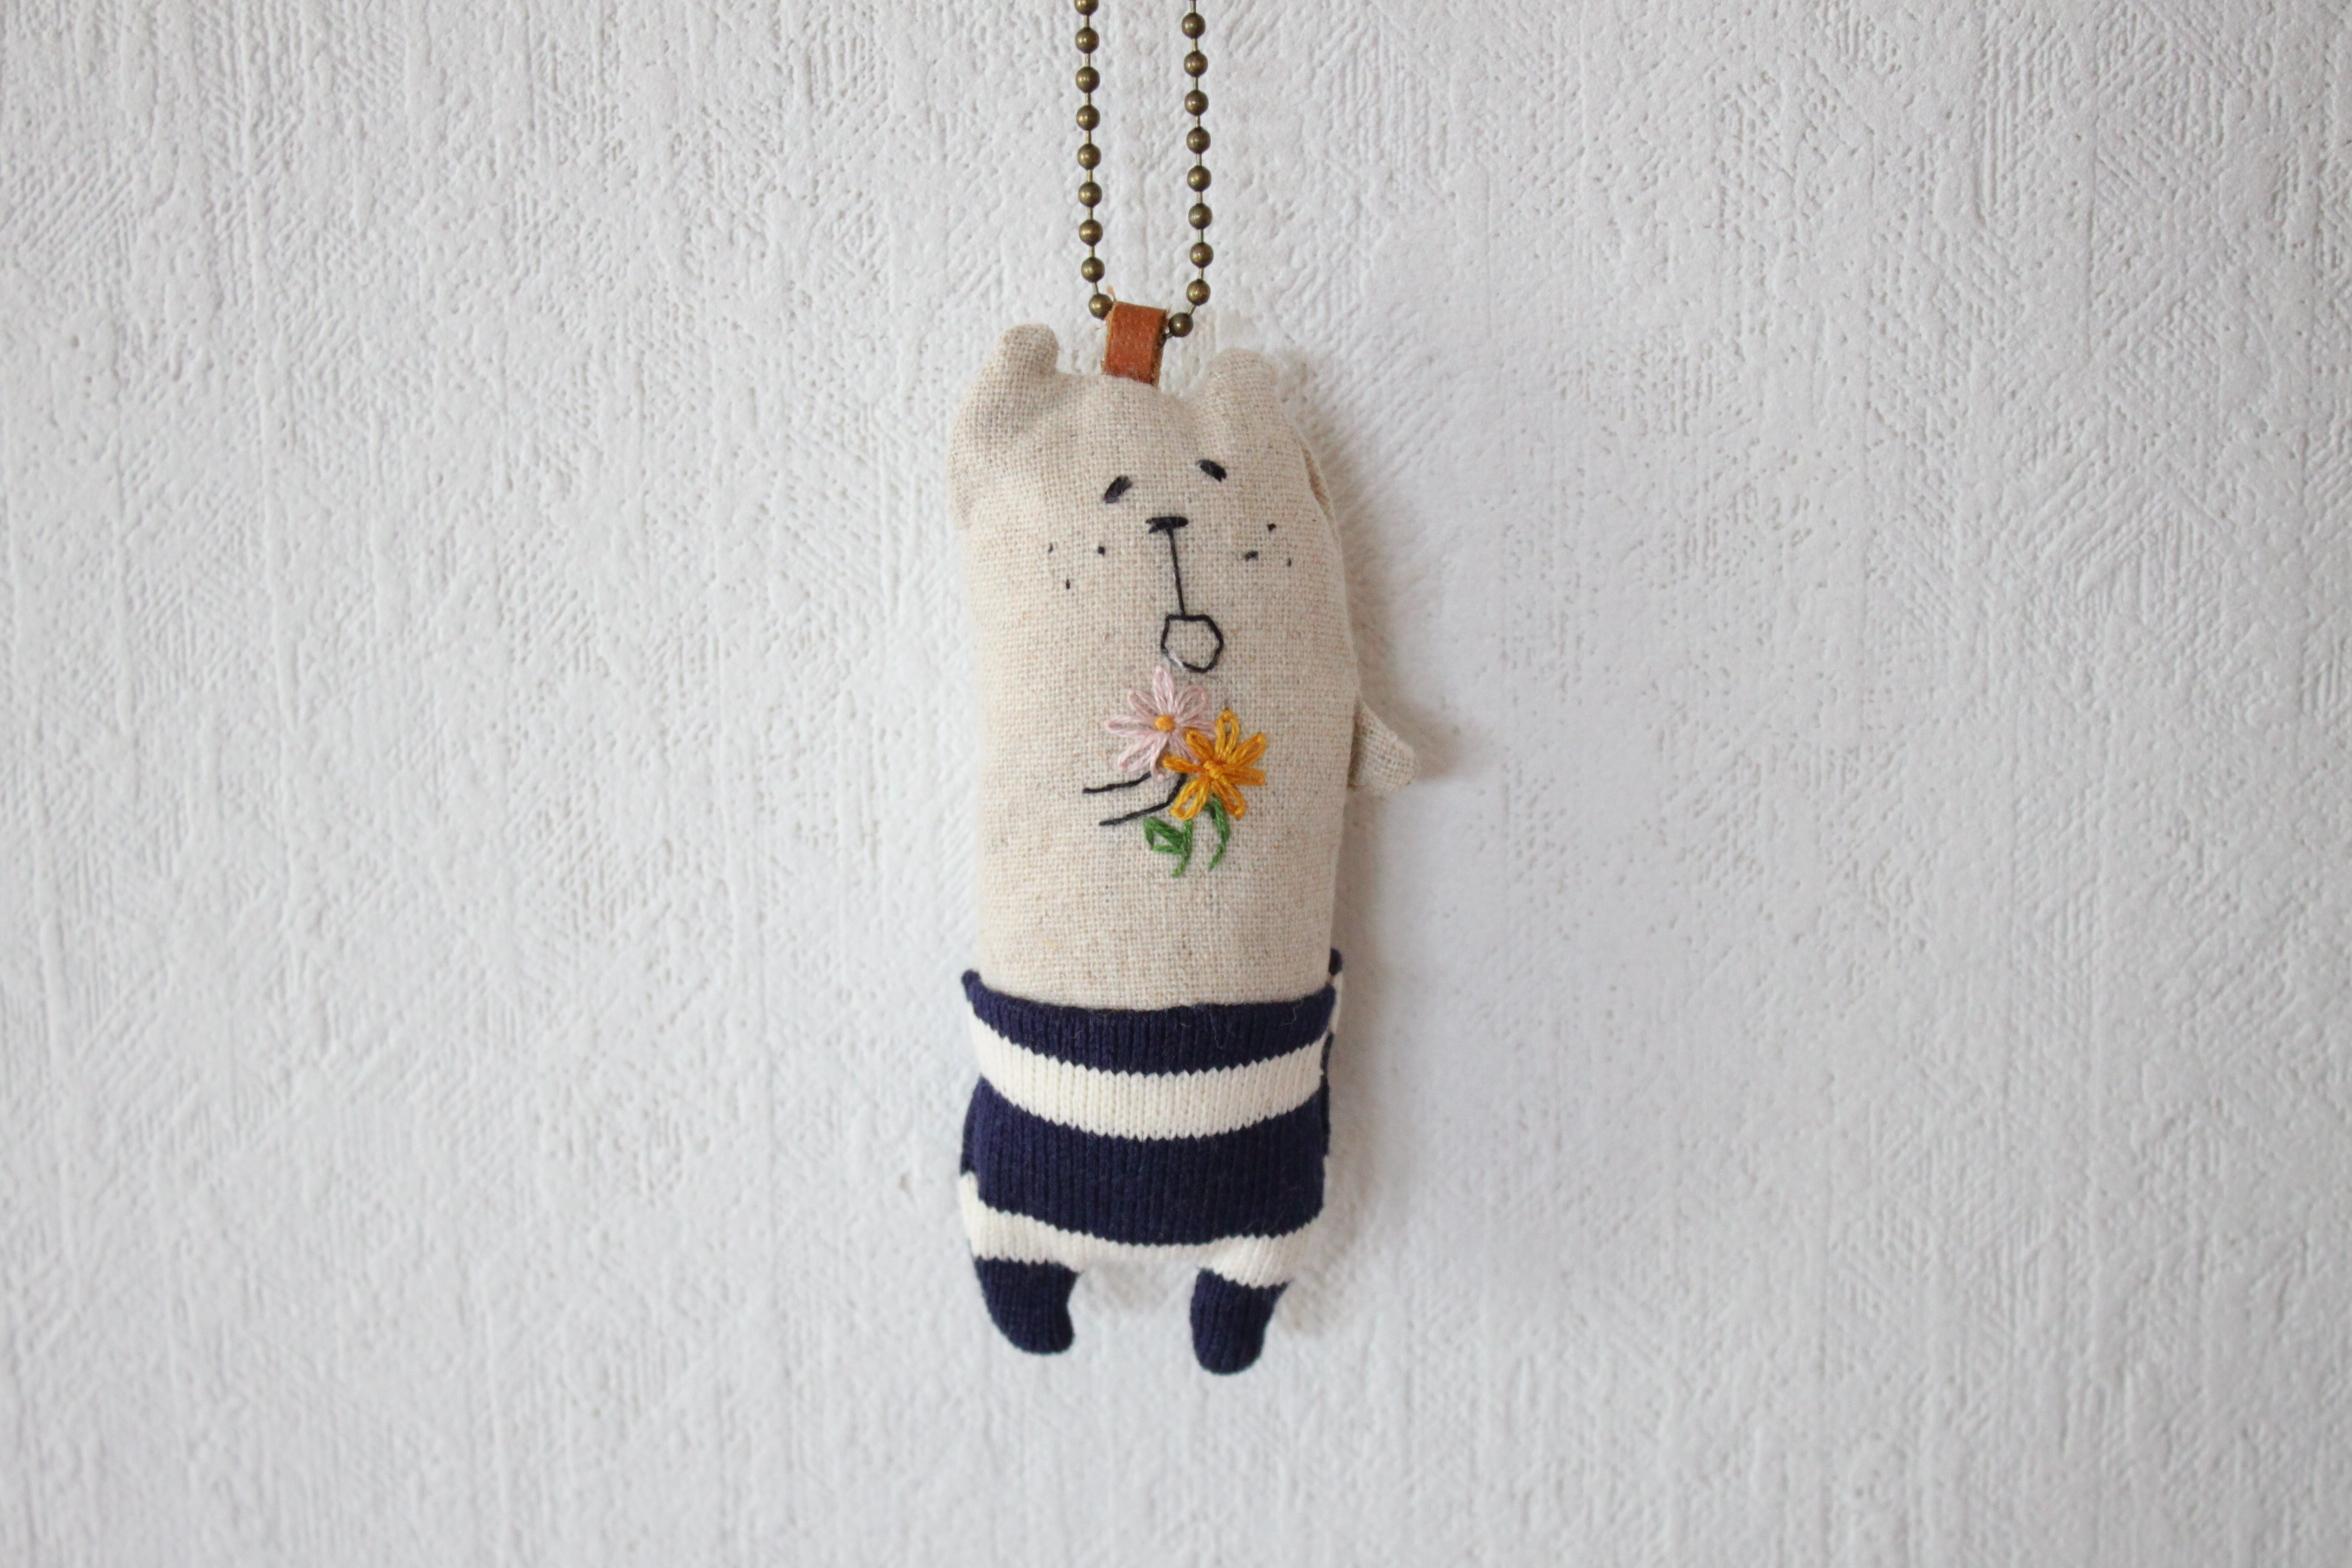 muuちゃん 手刺繍 花束 マスコット